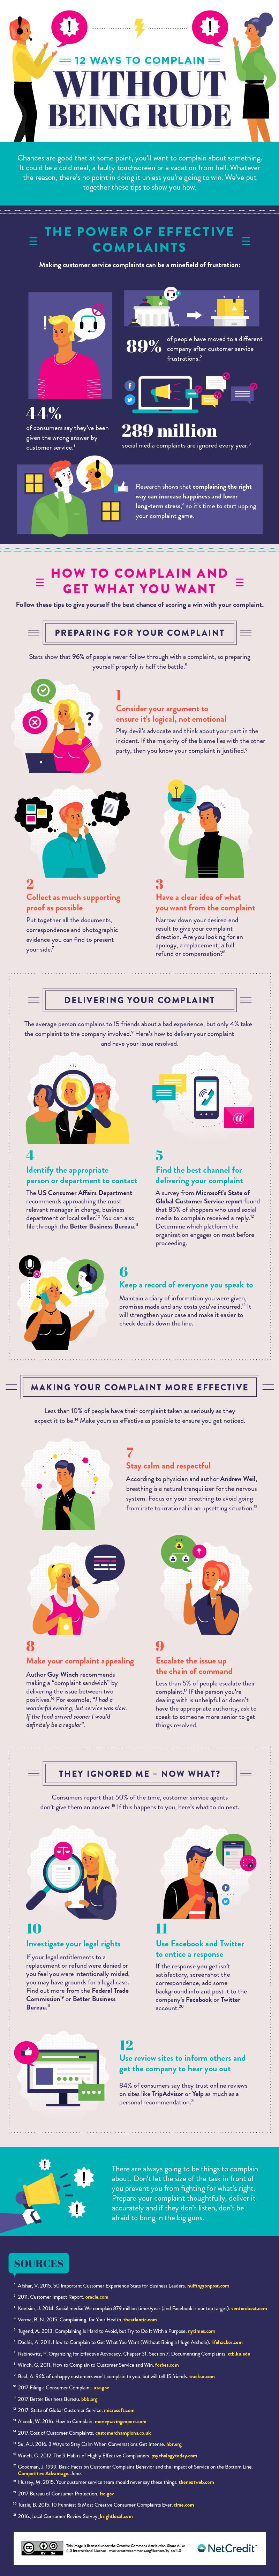 complain infographic